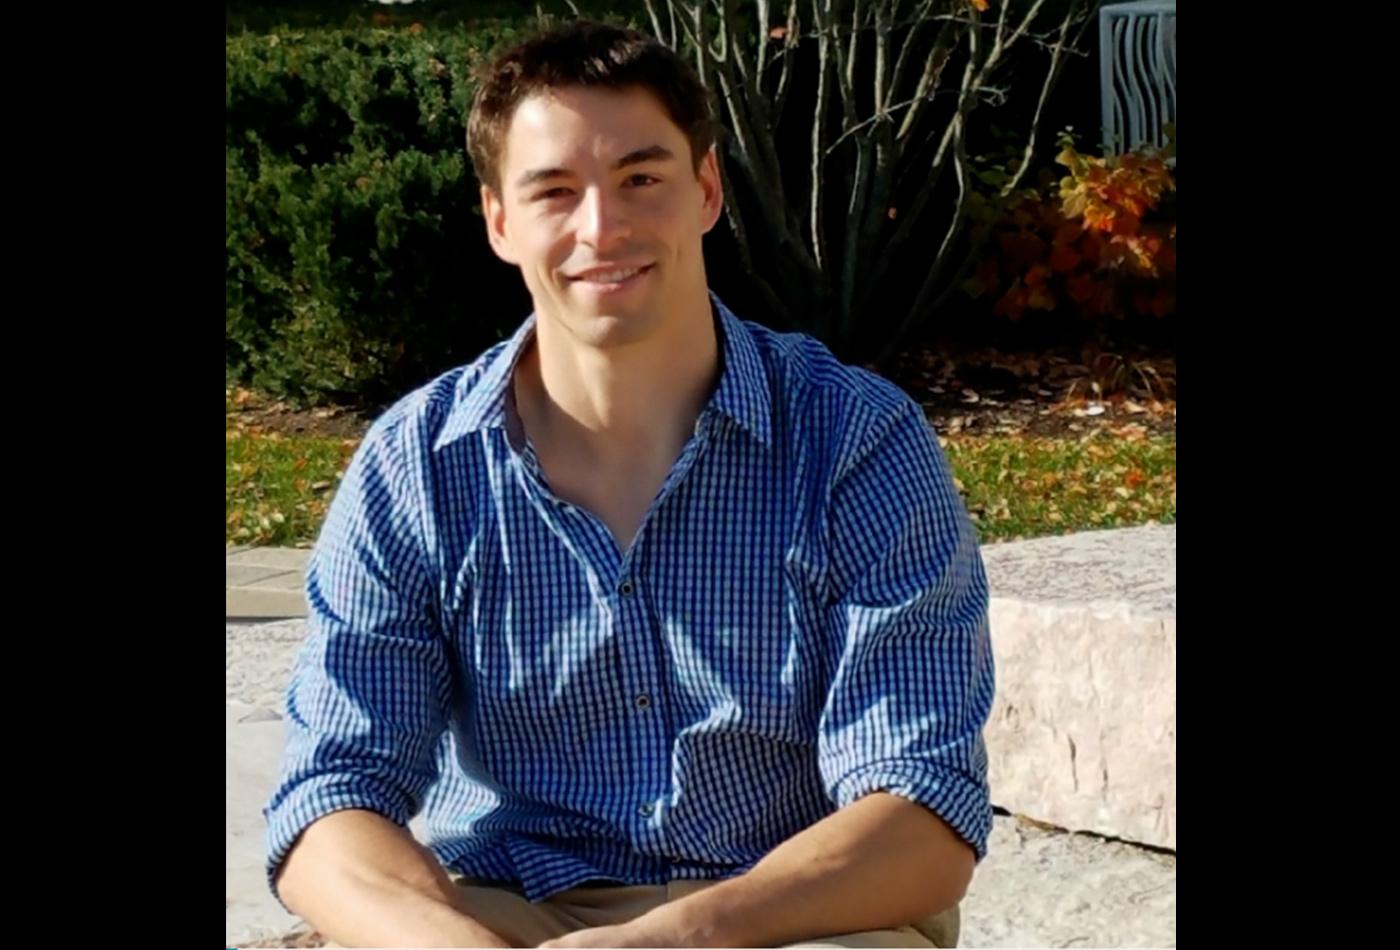 A male graduate student smiles outside.